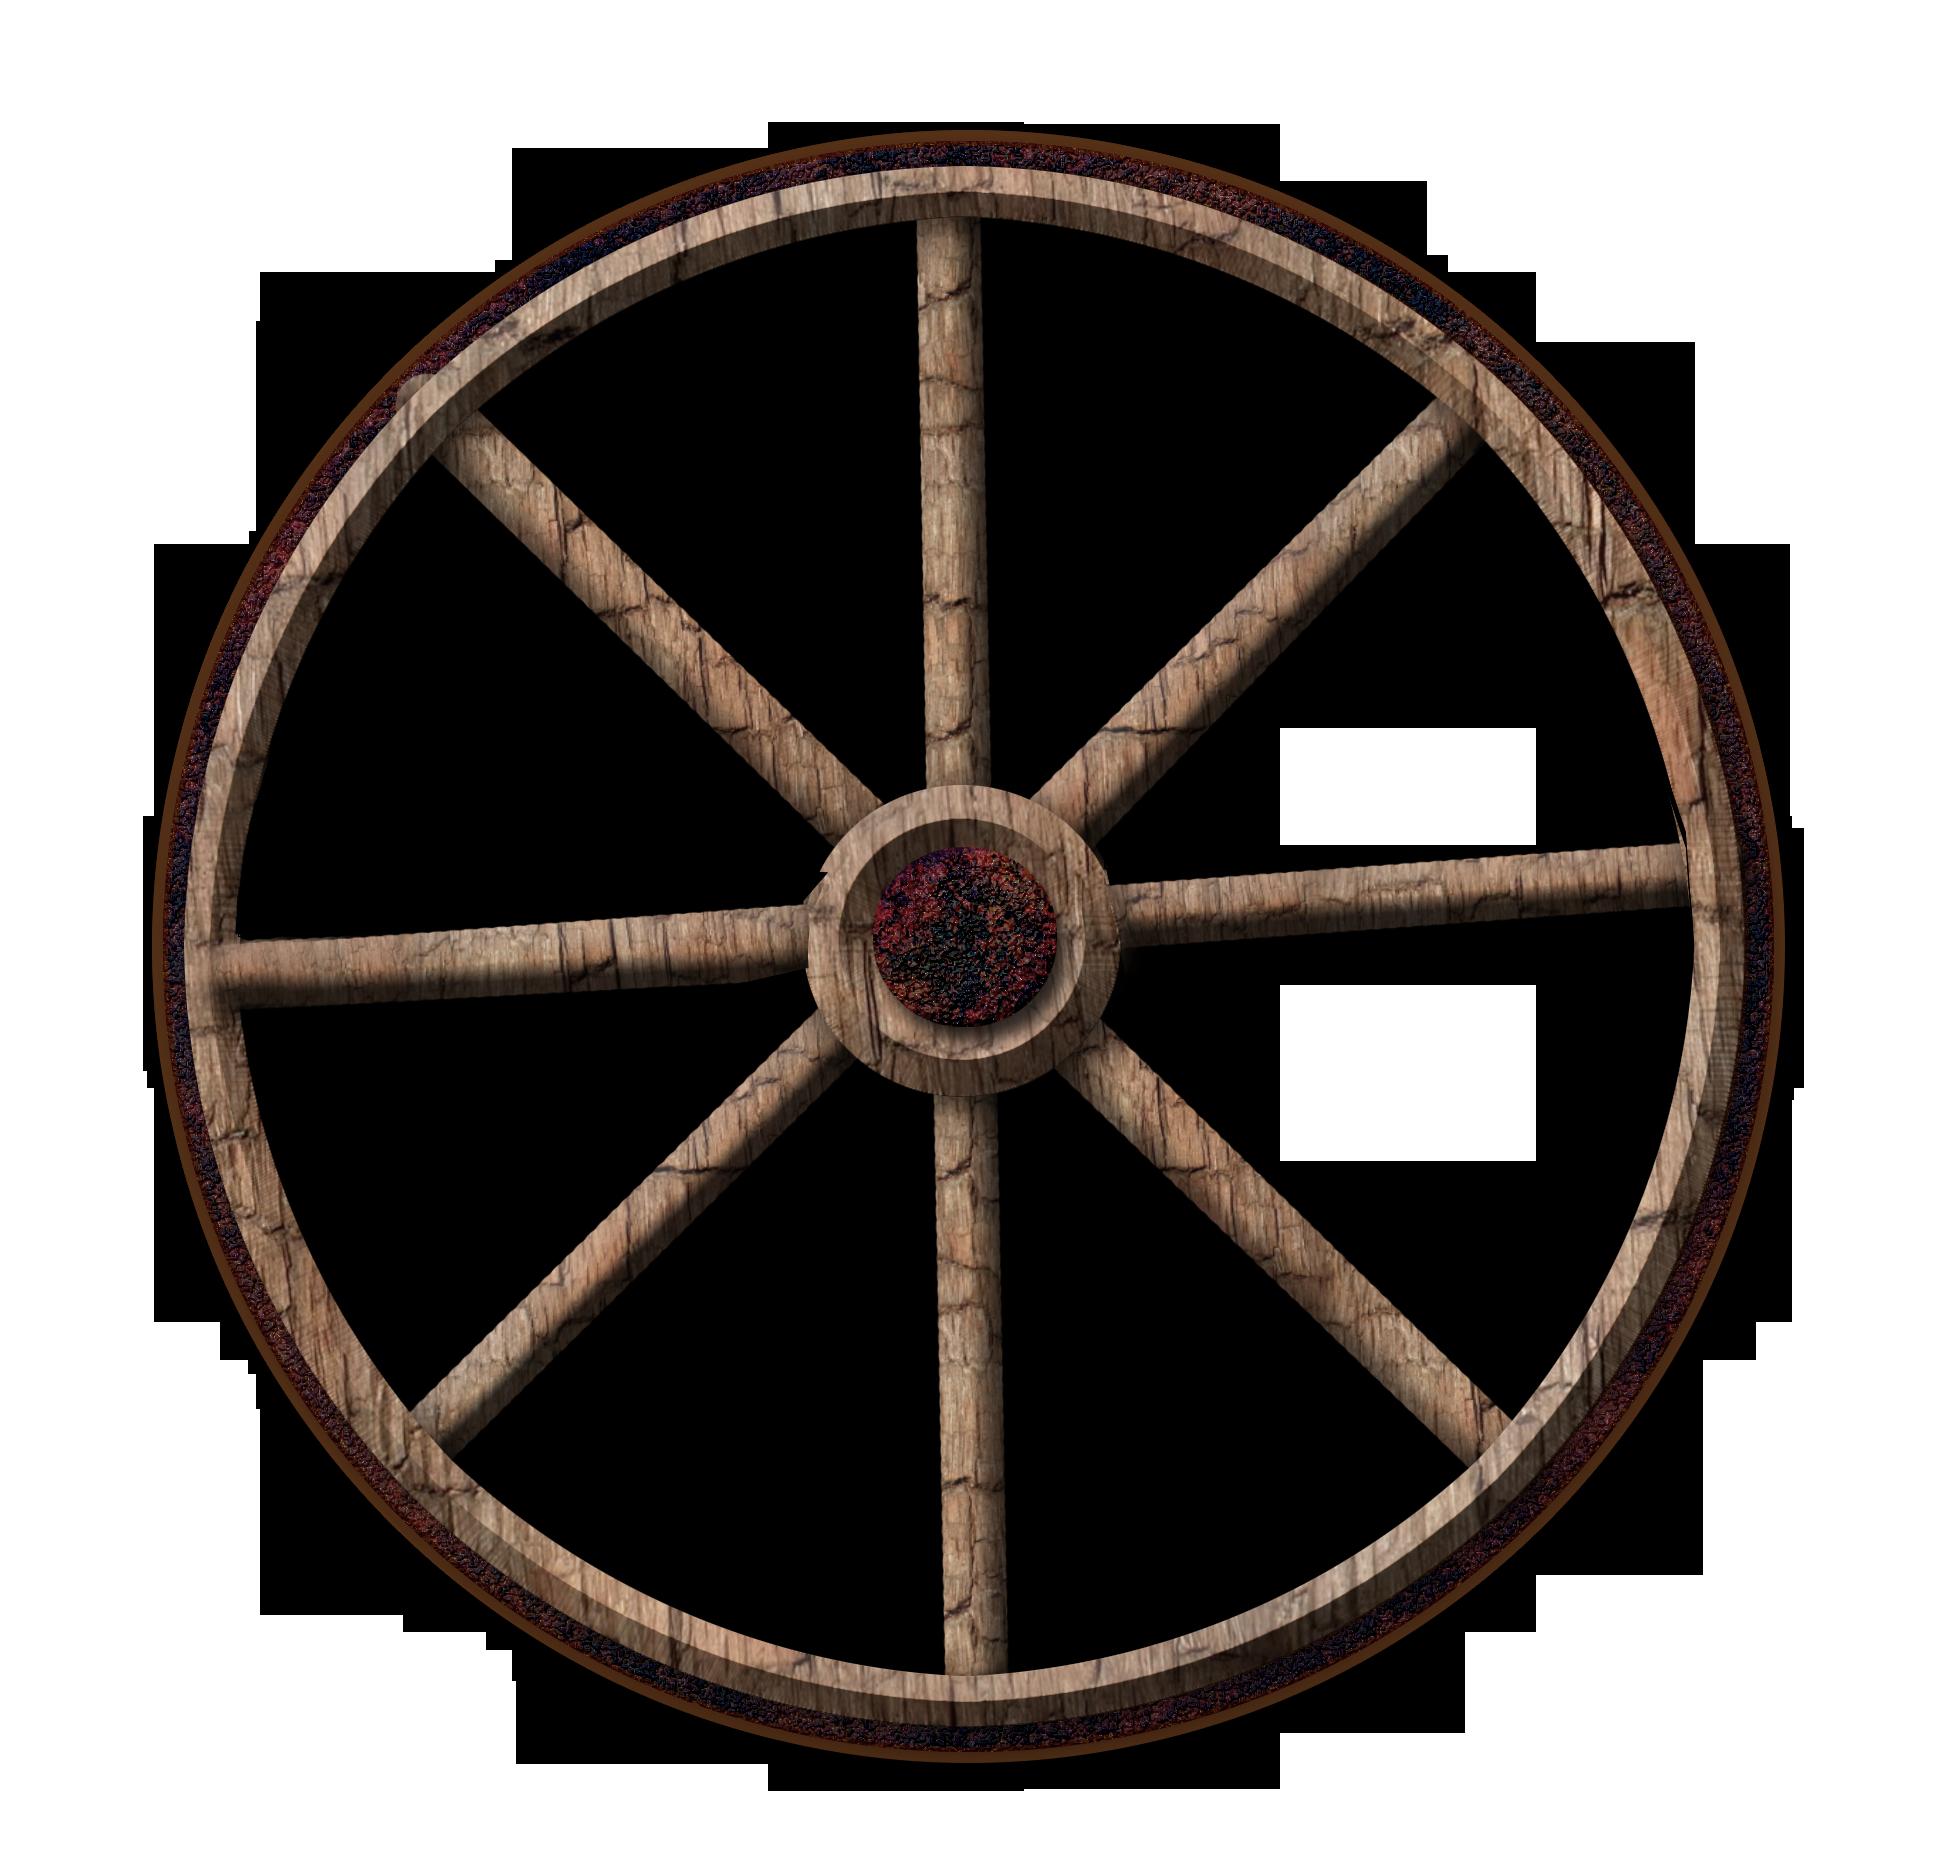 Wagon Wheel Clipart.